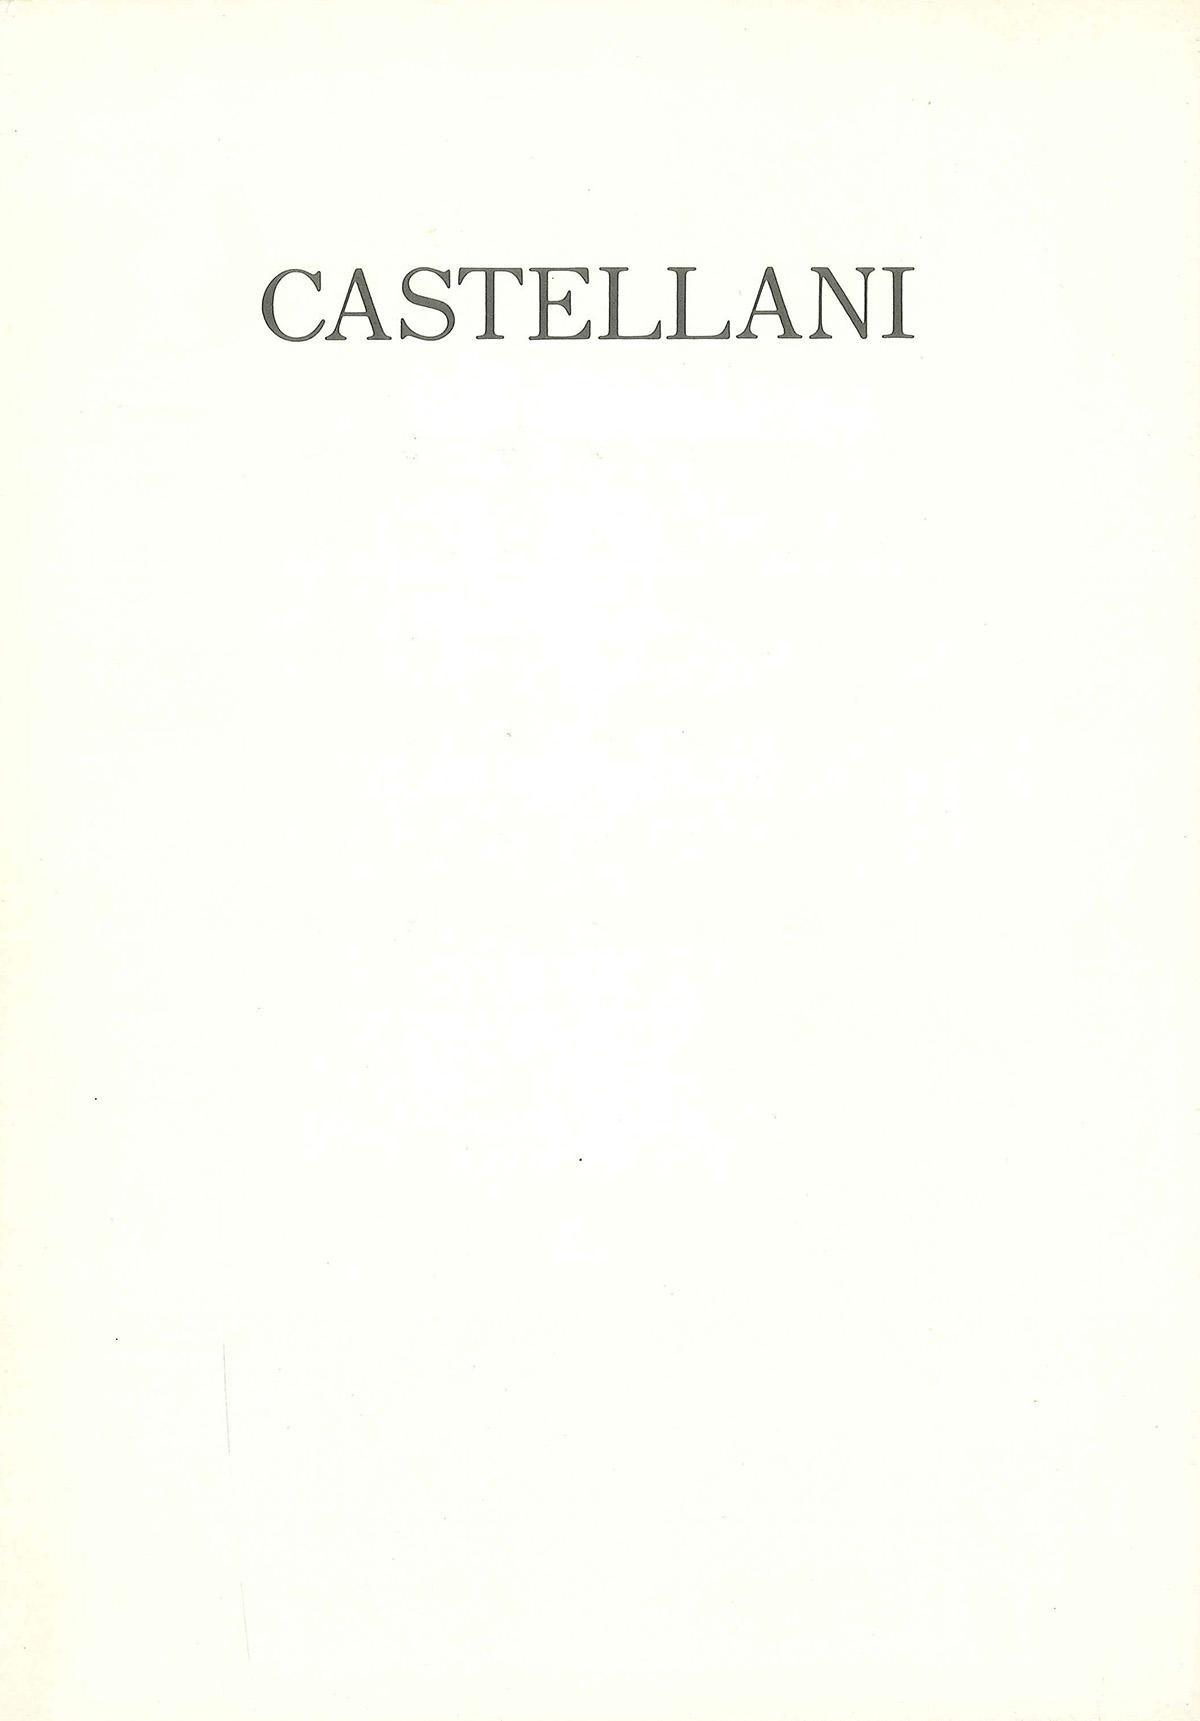 Cover - Castellani, Pier Giovanni Castagnoli, 1988, Kodama Gallery, Osaka (JPN)